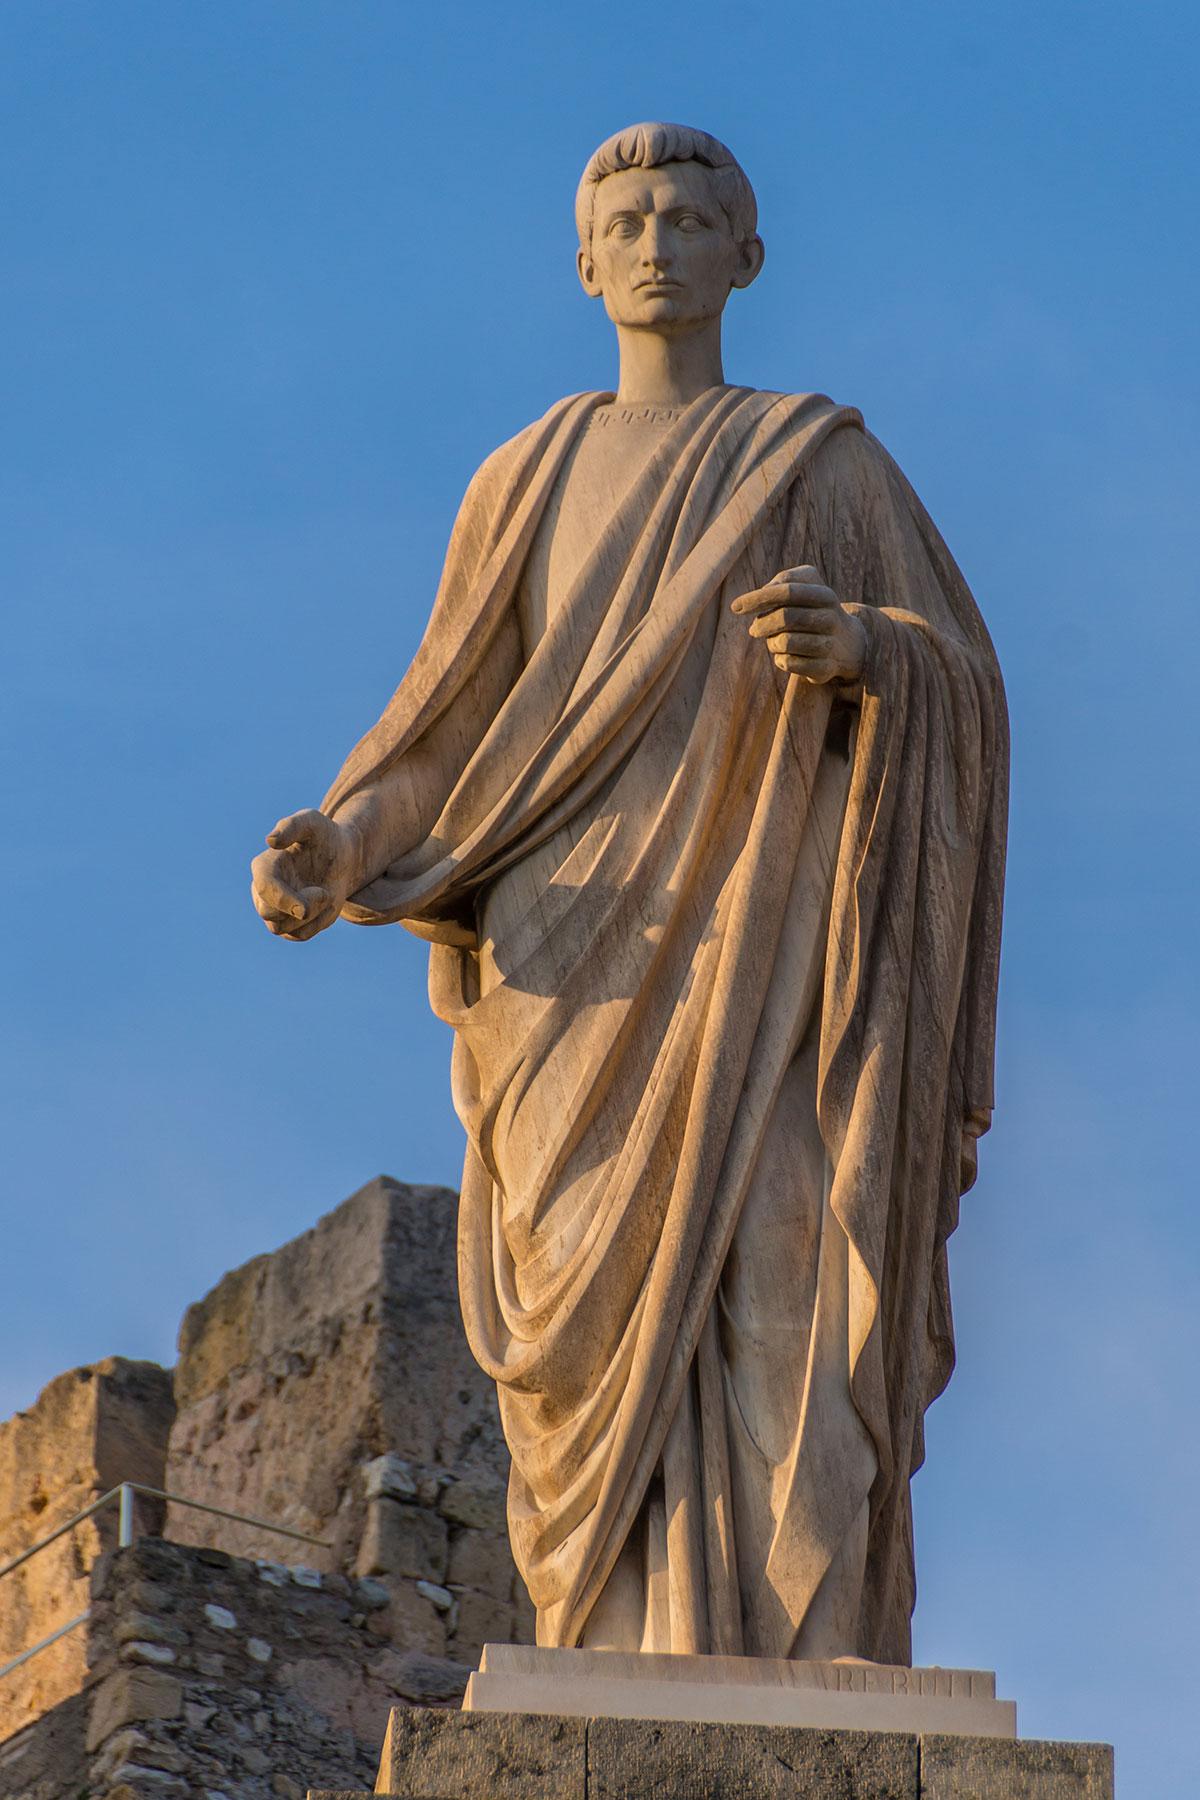 Spanien, Katalonien, Tarragona, römische Statue am Passier de Sant Antoni